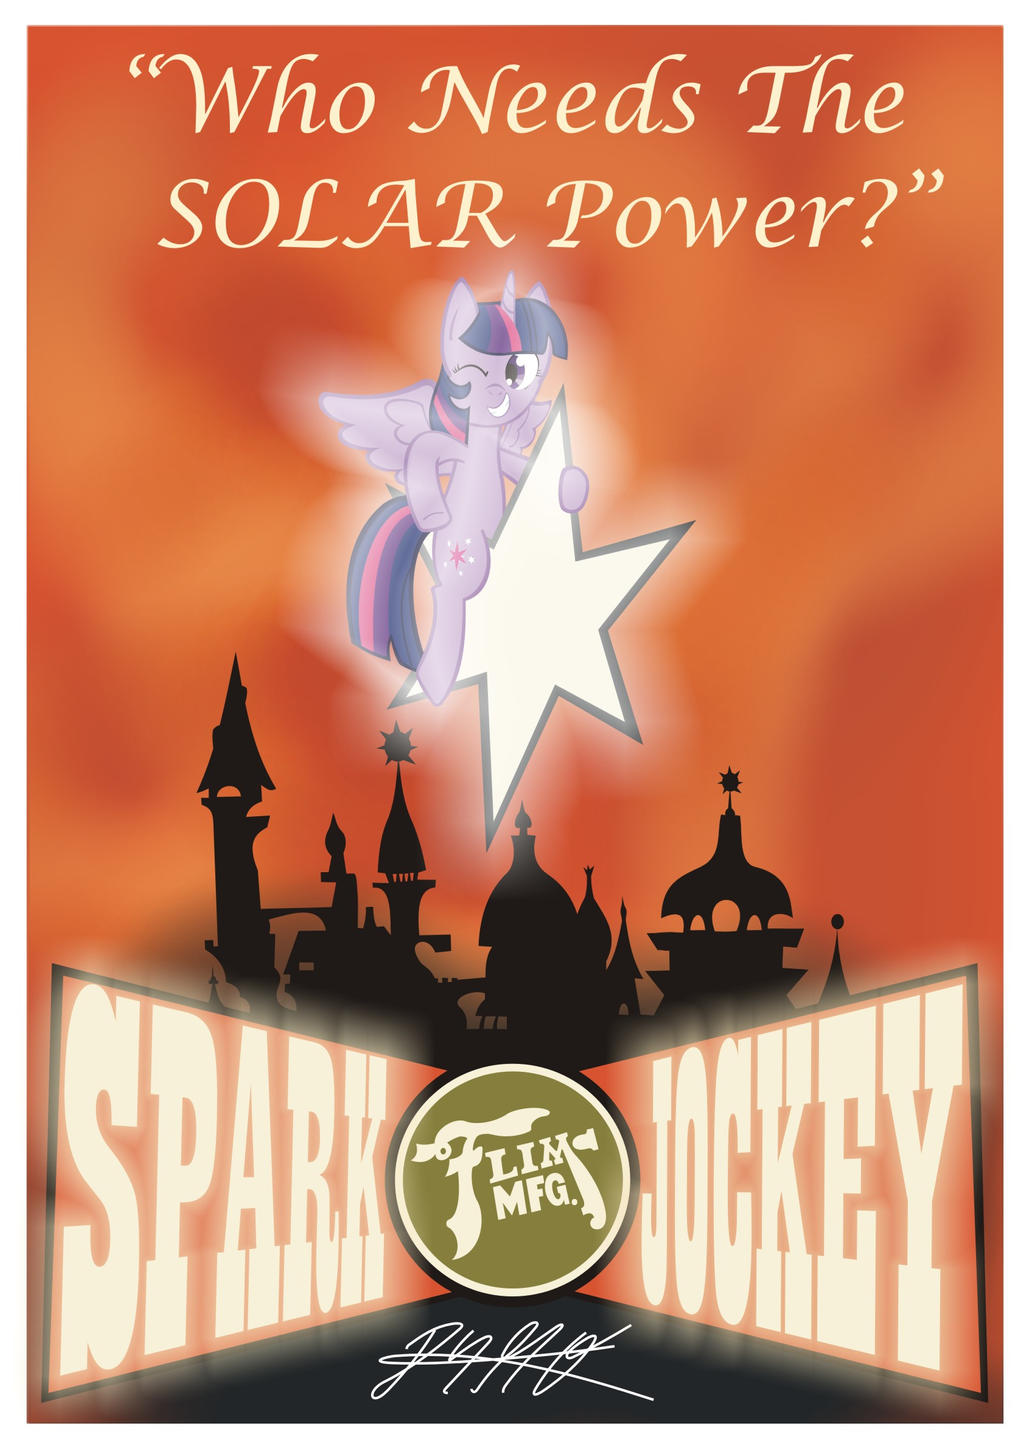 Spark Jockey - Bioshock Infinite by dsmo